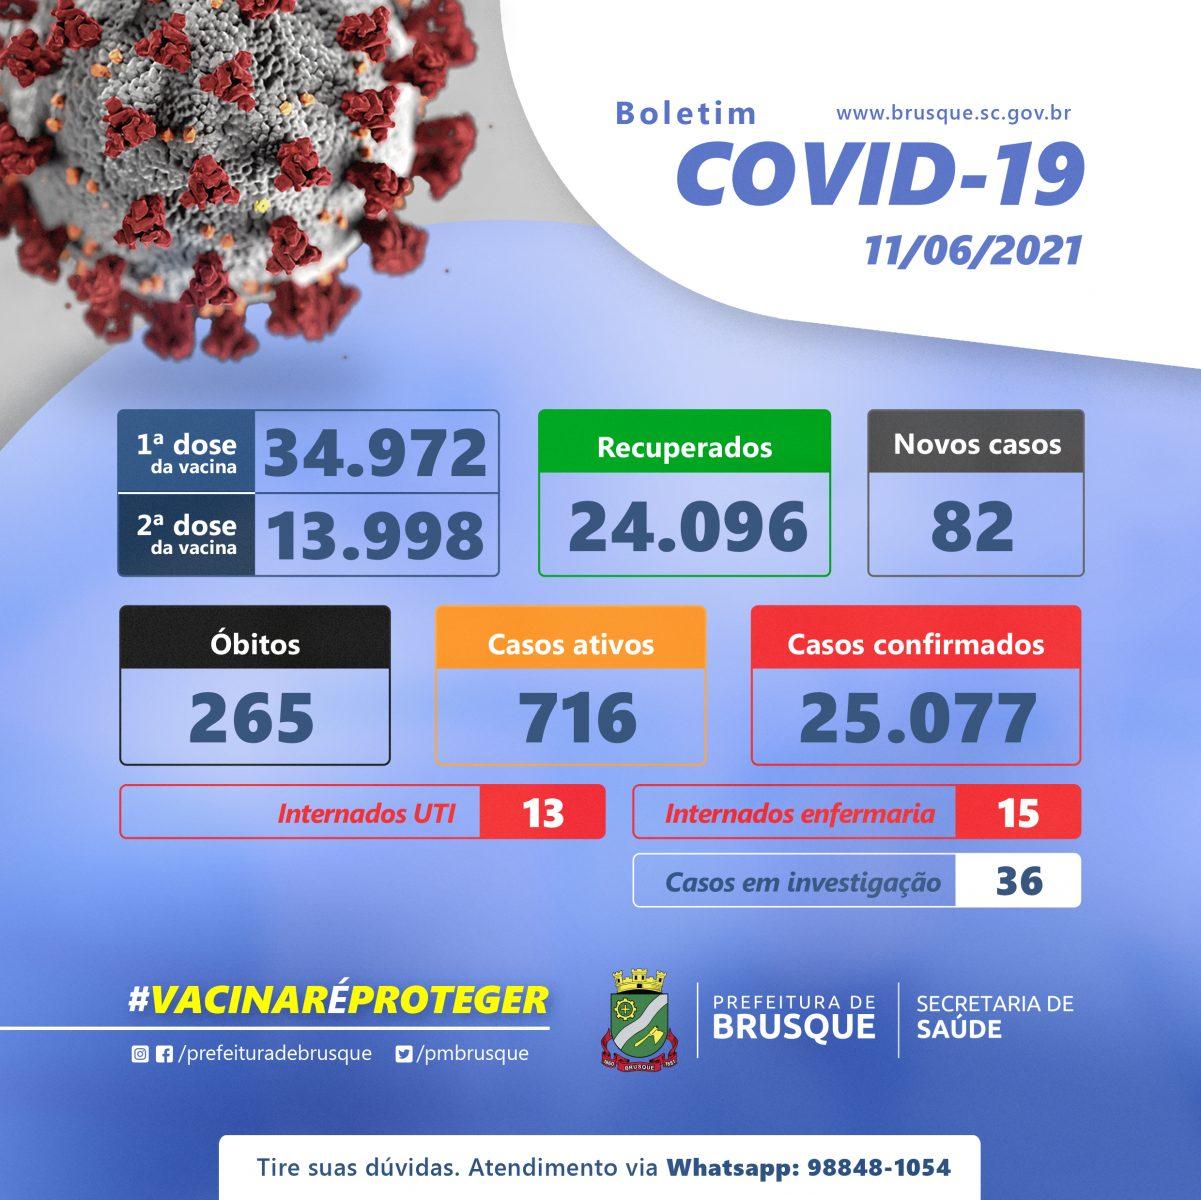 Covid-19: Confira o boletim epidemiológico desta sexta-feira (11)